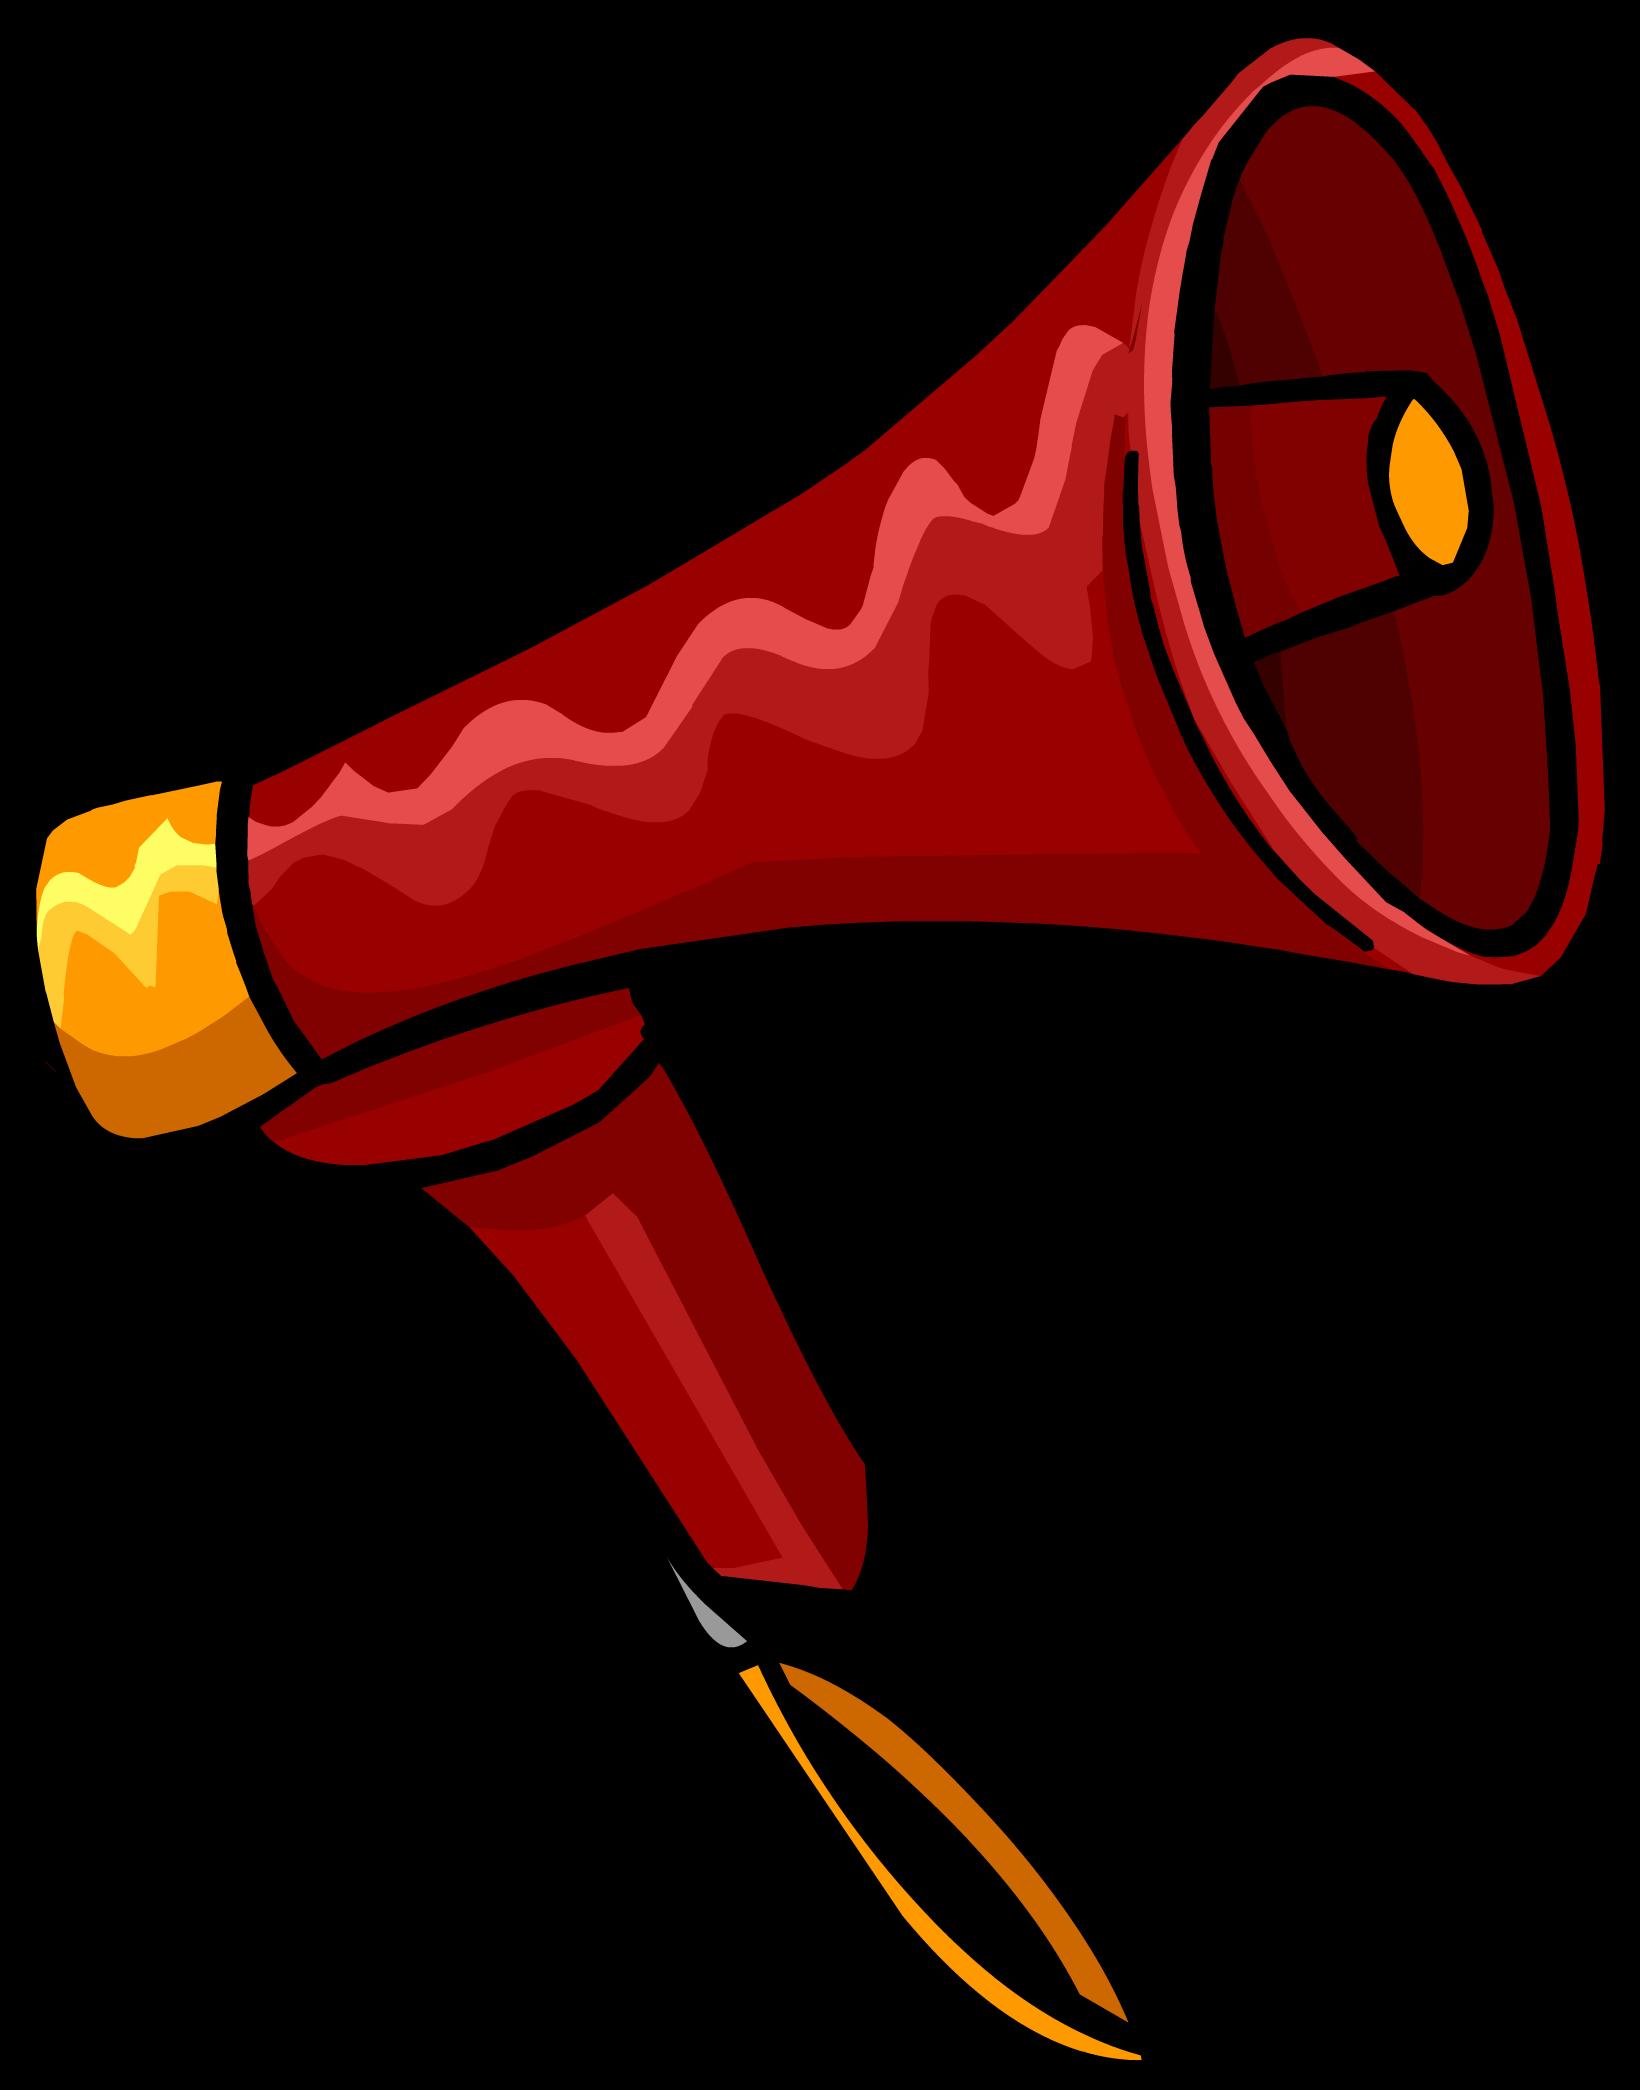 Club clipart megaphone Megaphone FANDOM powered by Wiki